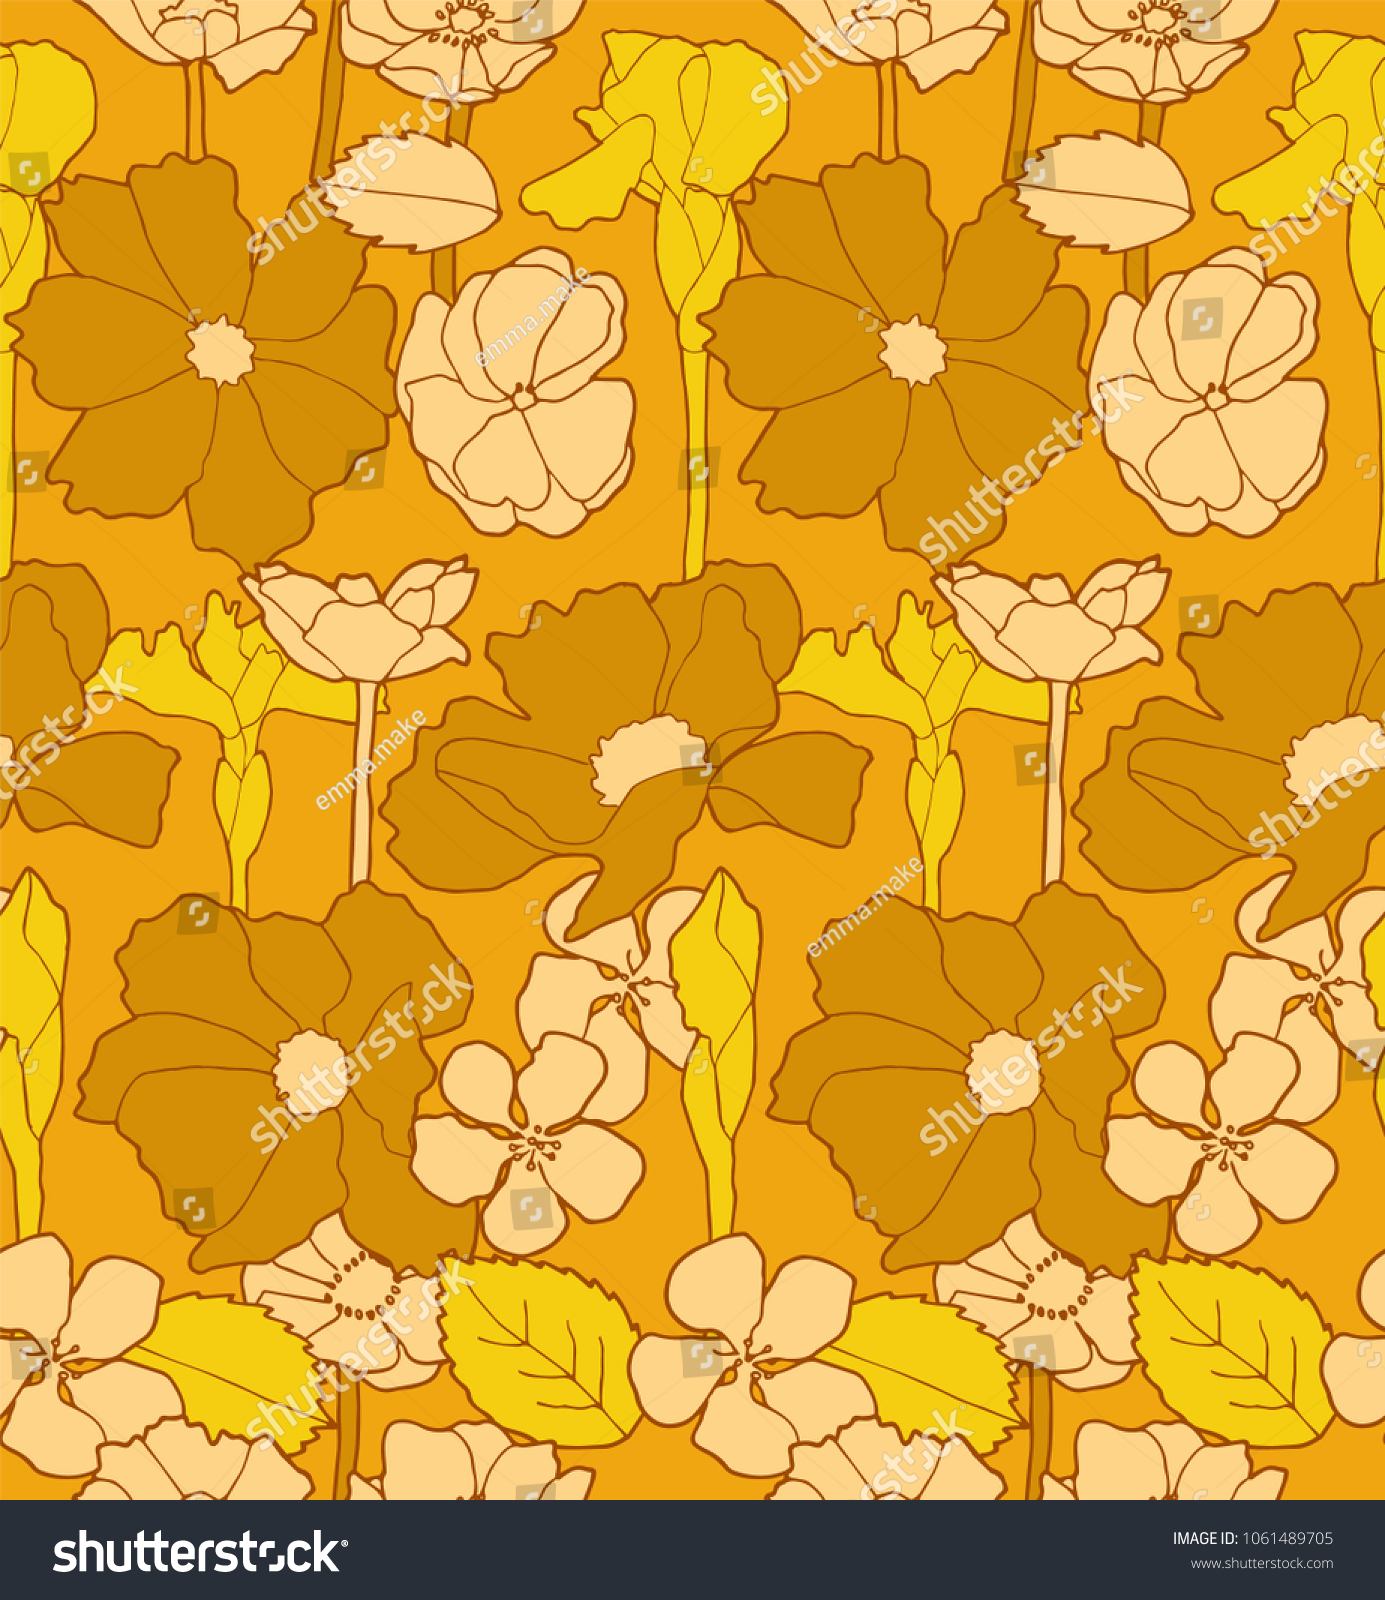 Retro 60s Floral Wallpaper Seamless Stock Illustration 1061489705